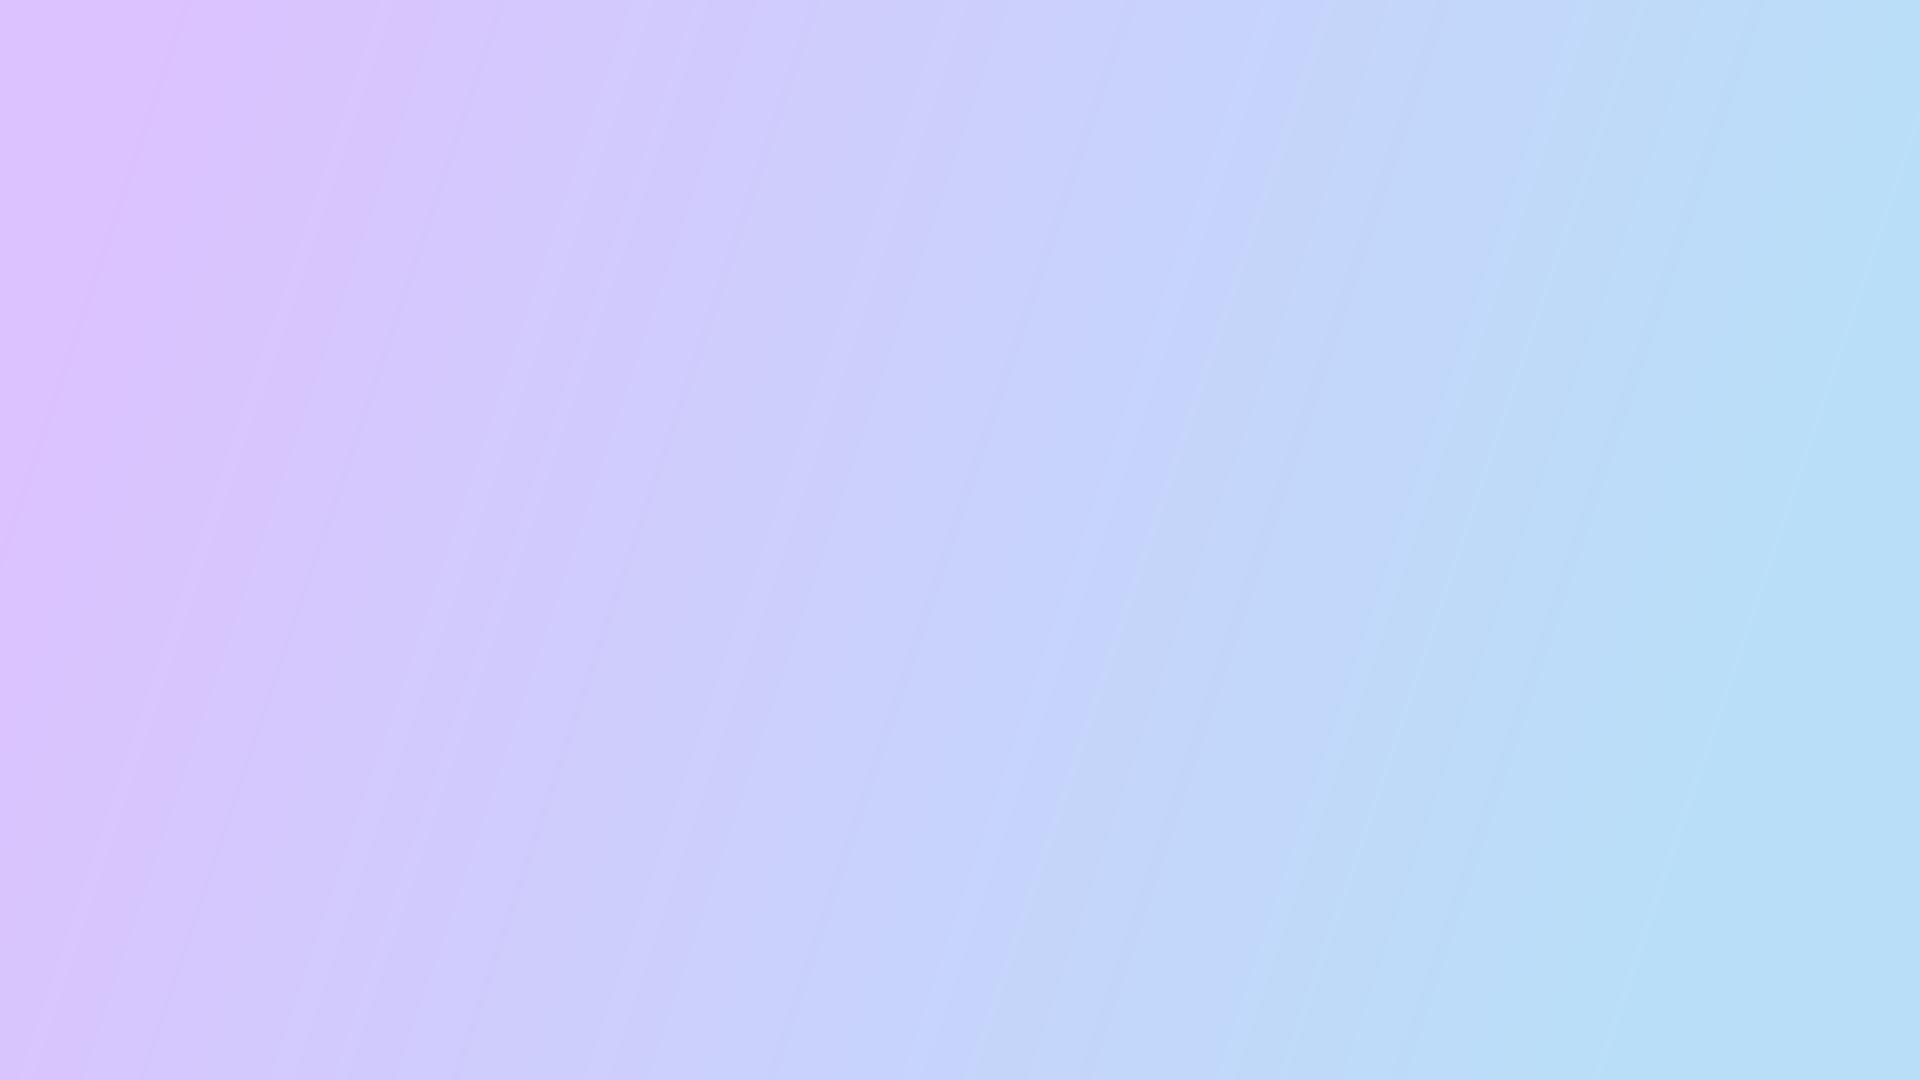 purple to blue Gradient